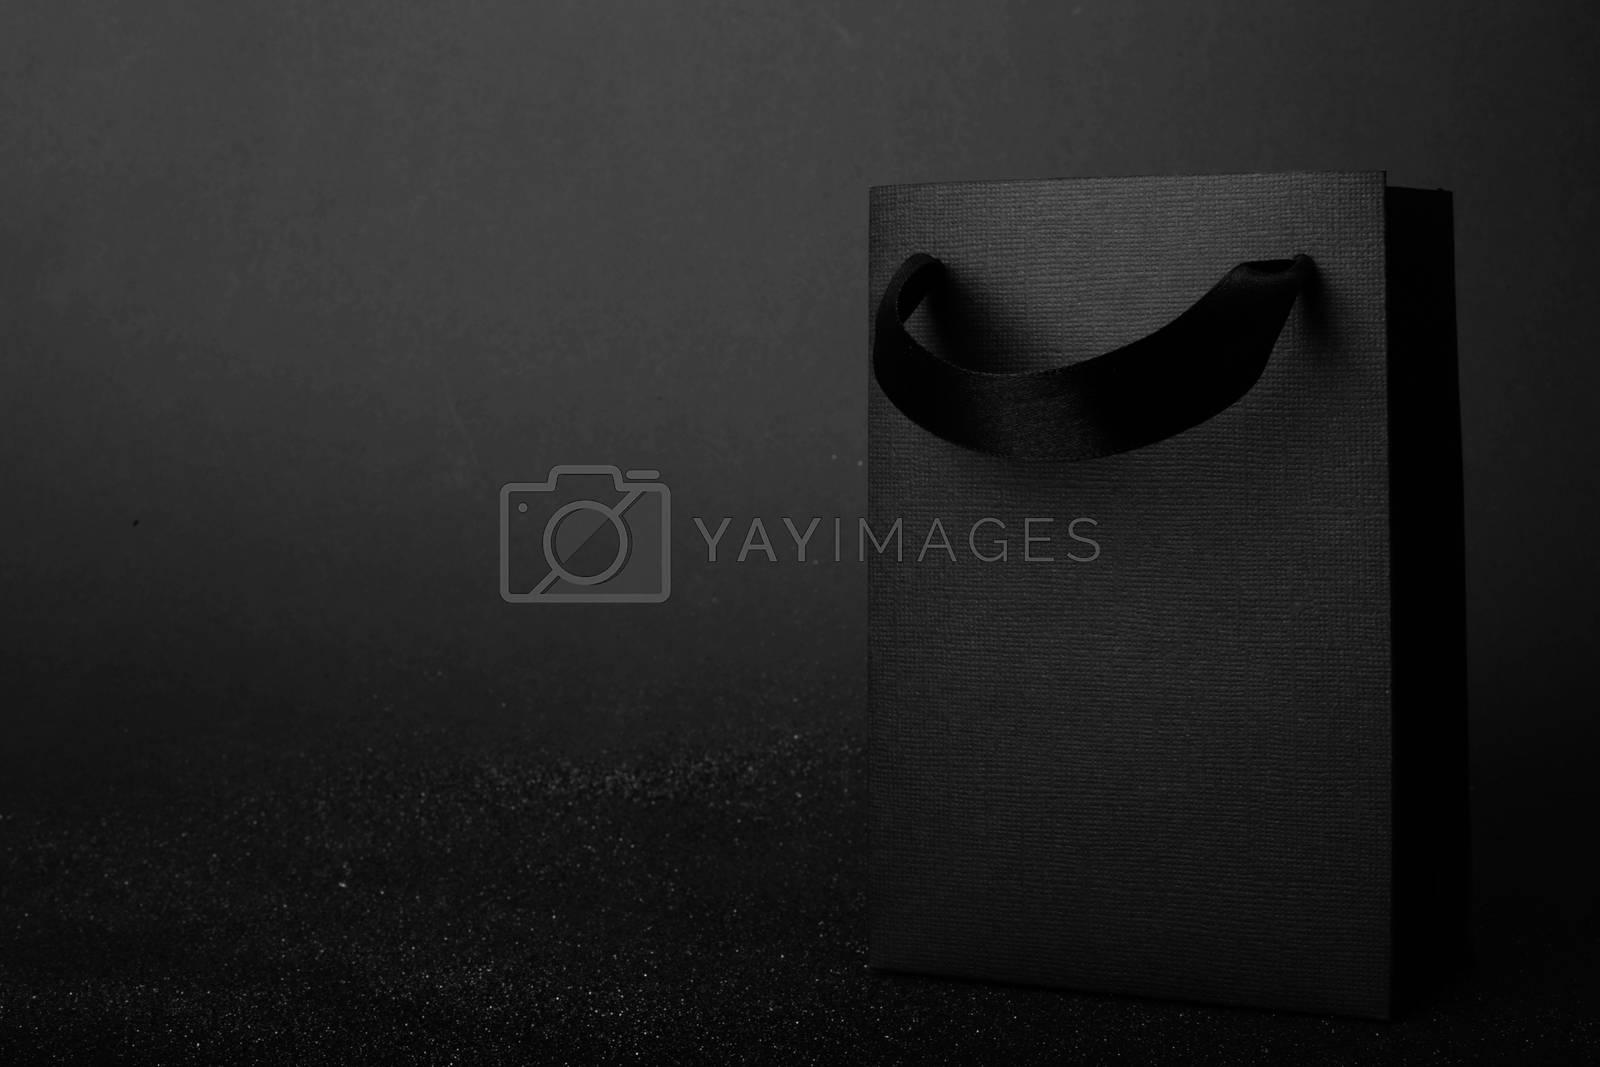 Royalty free image of Black Friday paper bag by destillat